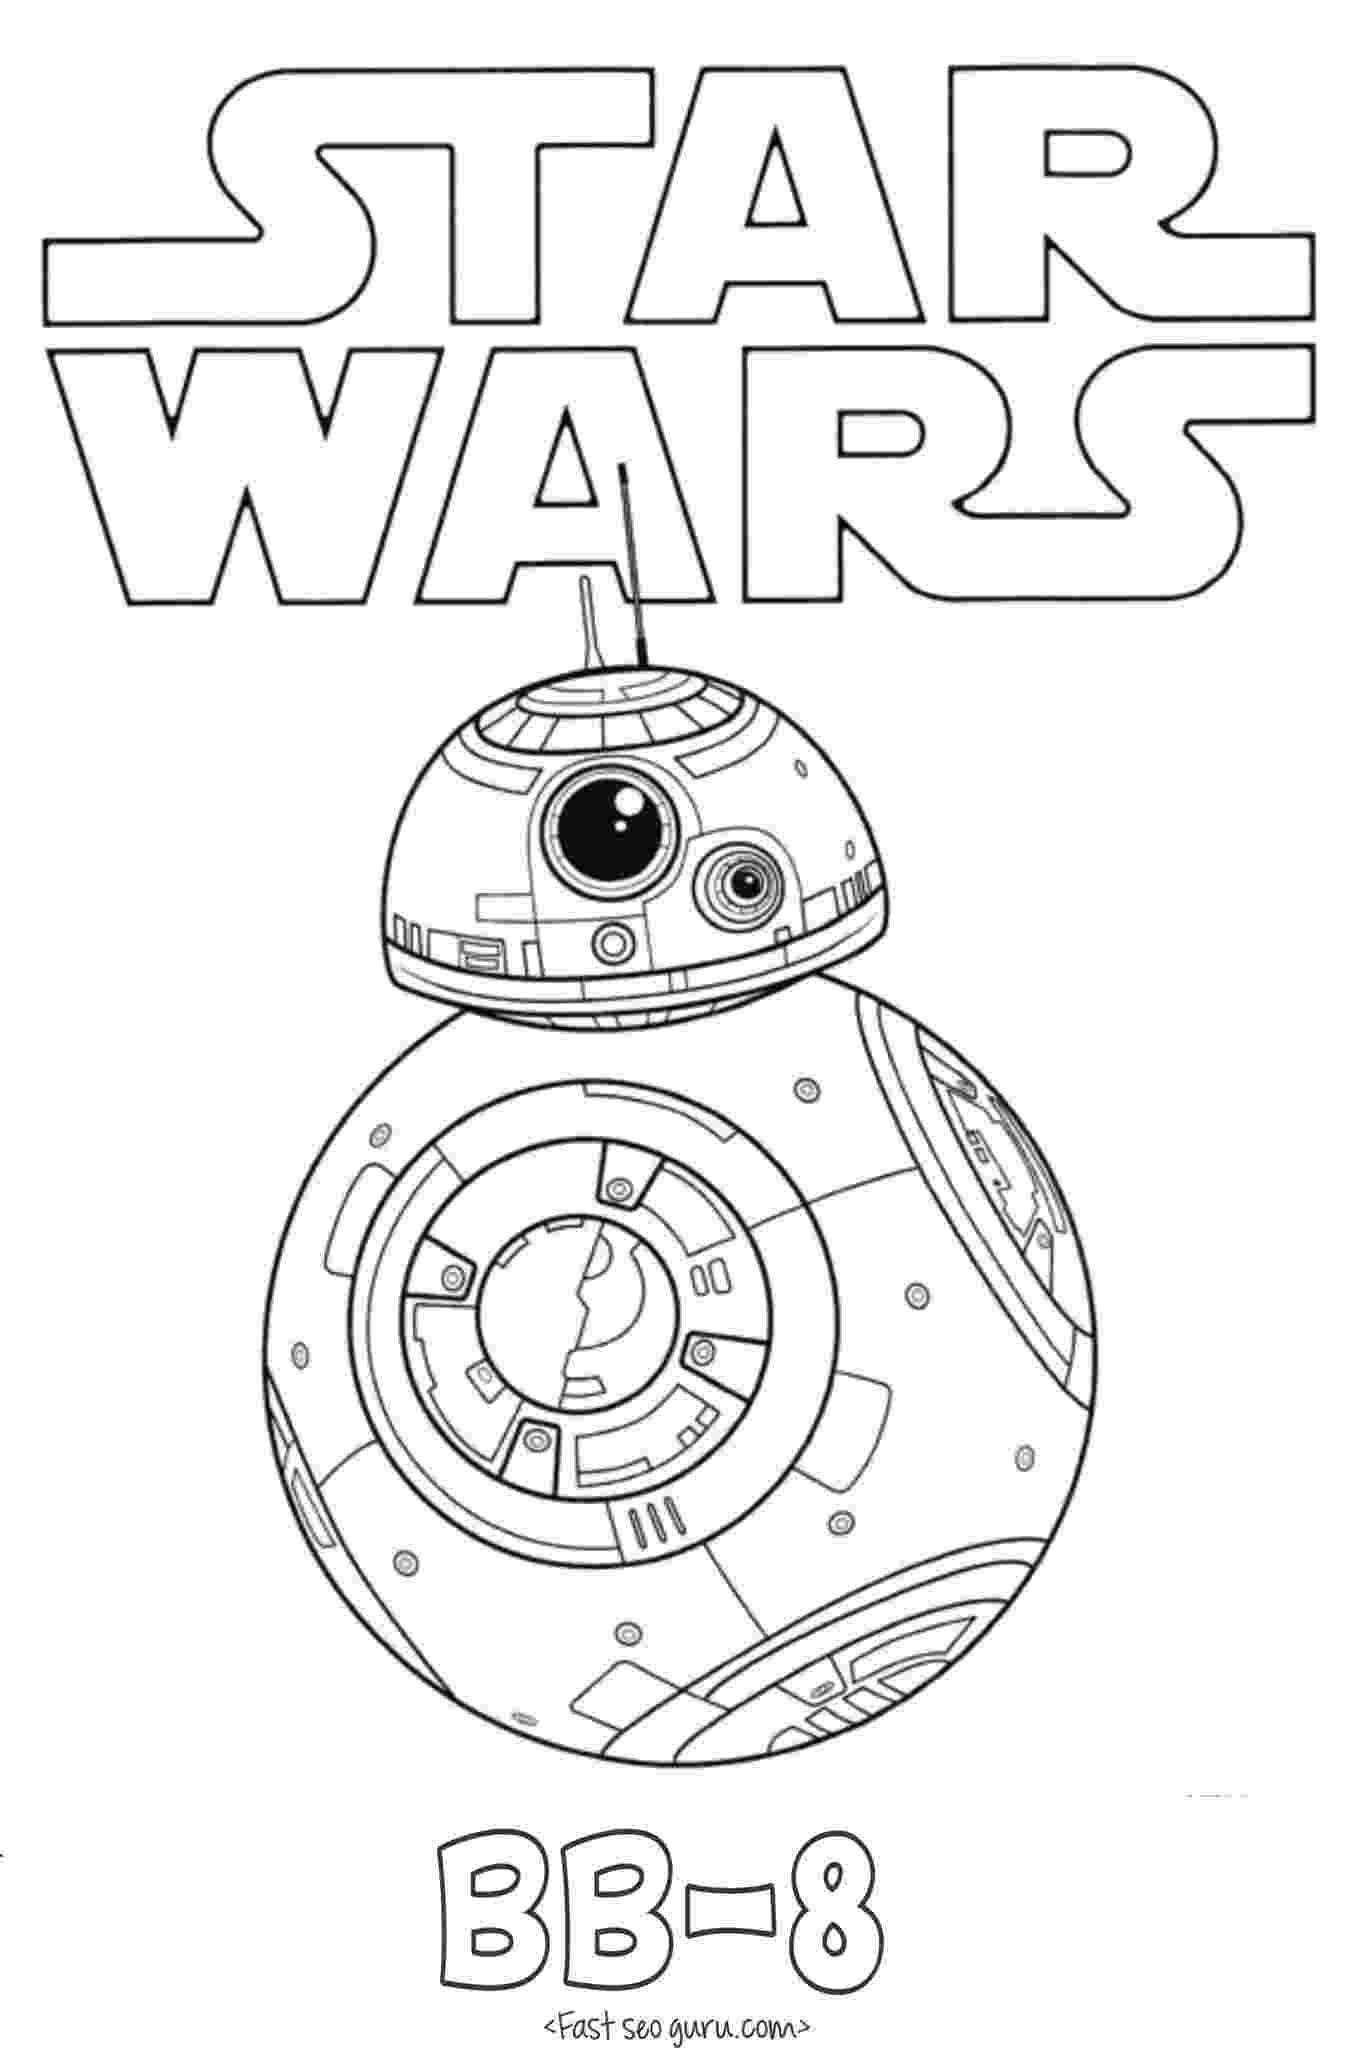 star wars printable coloring pages printable star wars the force awakens bb 8 coloring pages pages coloring printable star wars